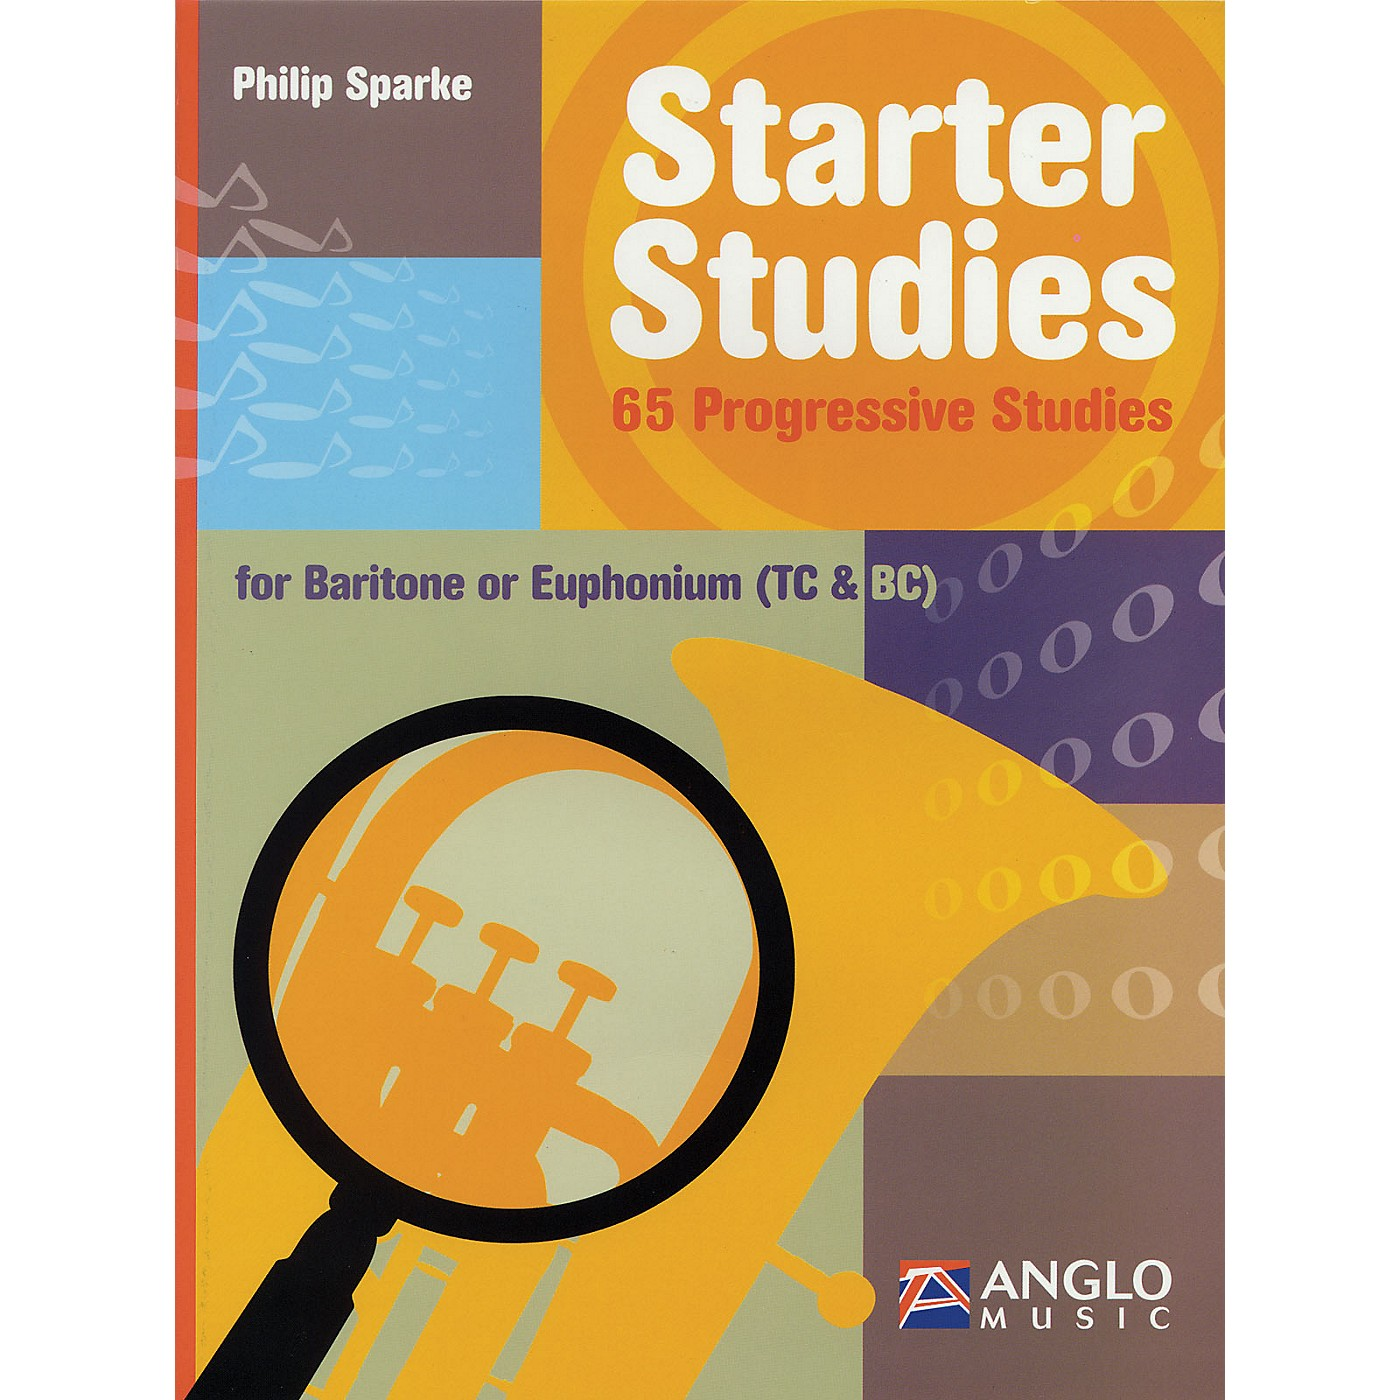 Anglo Music Starter Studies (Baritone/Euphonium) De Haske Solo Work Series Written by Philip Sparke thumbnail